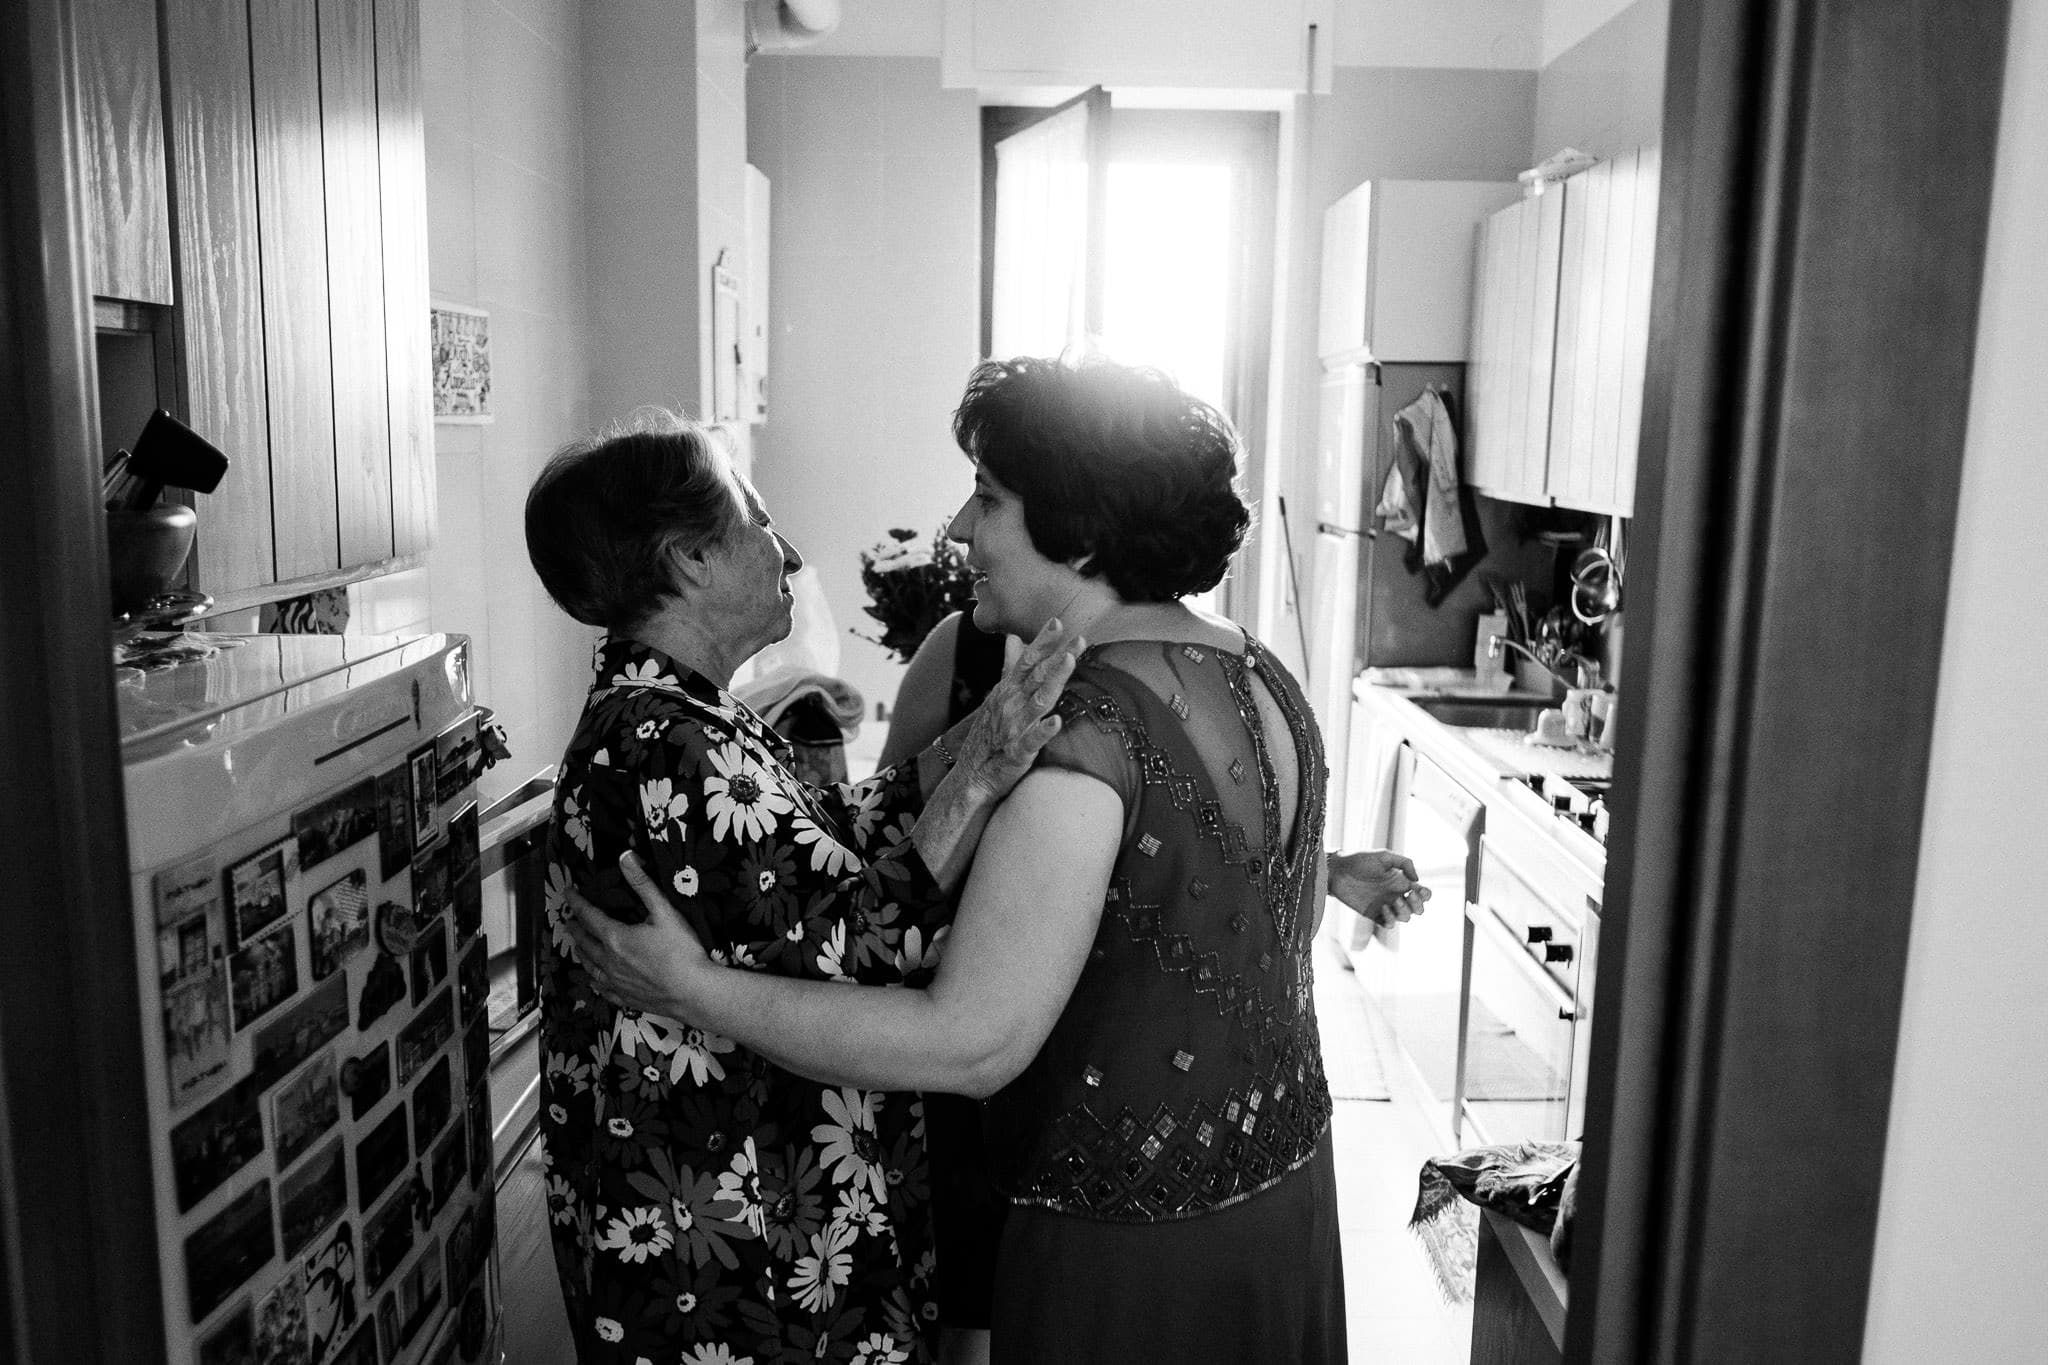 fotografo matrimonio cascina diodona varese lucarossifoto 00027